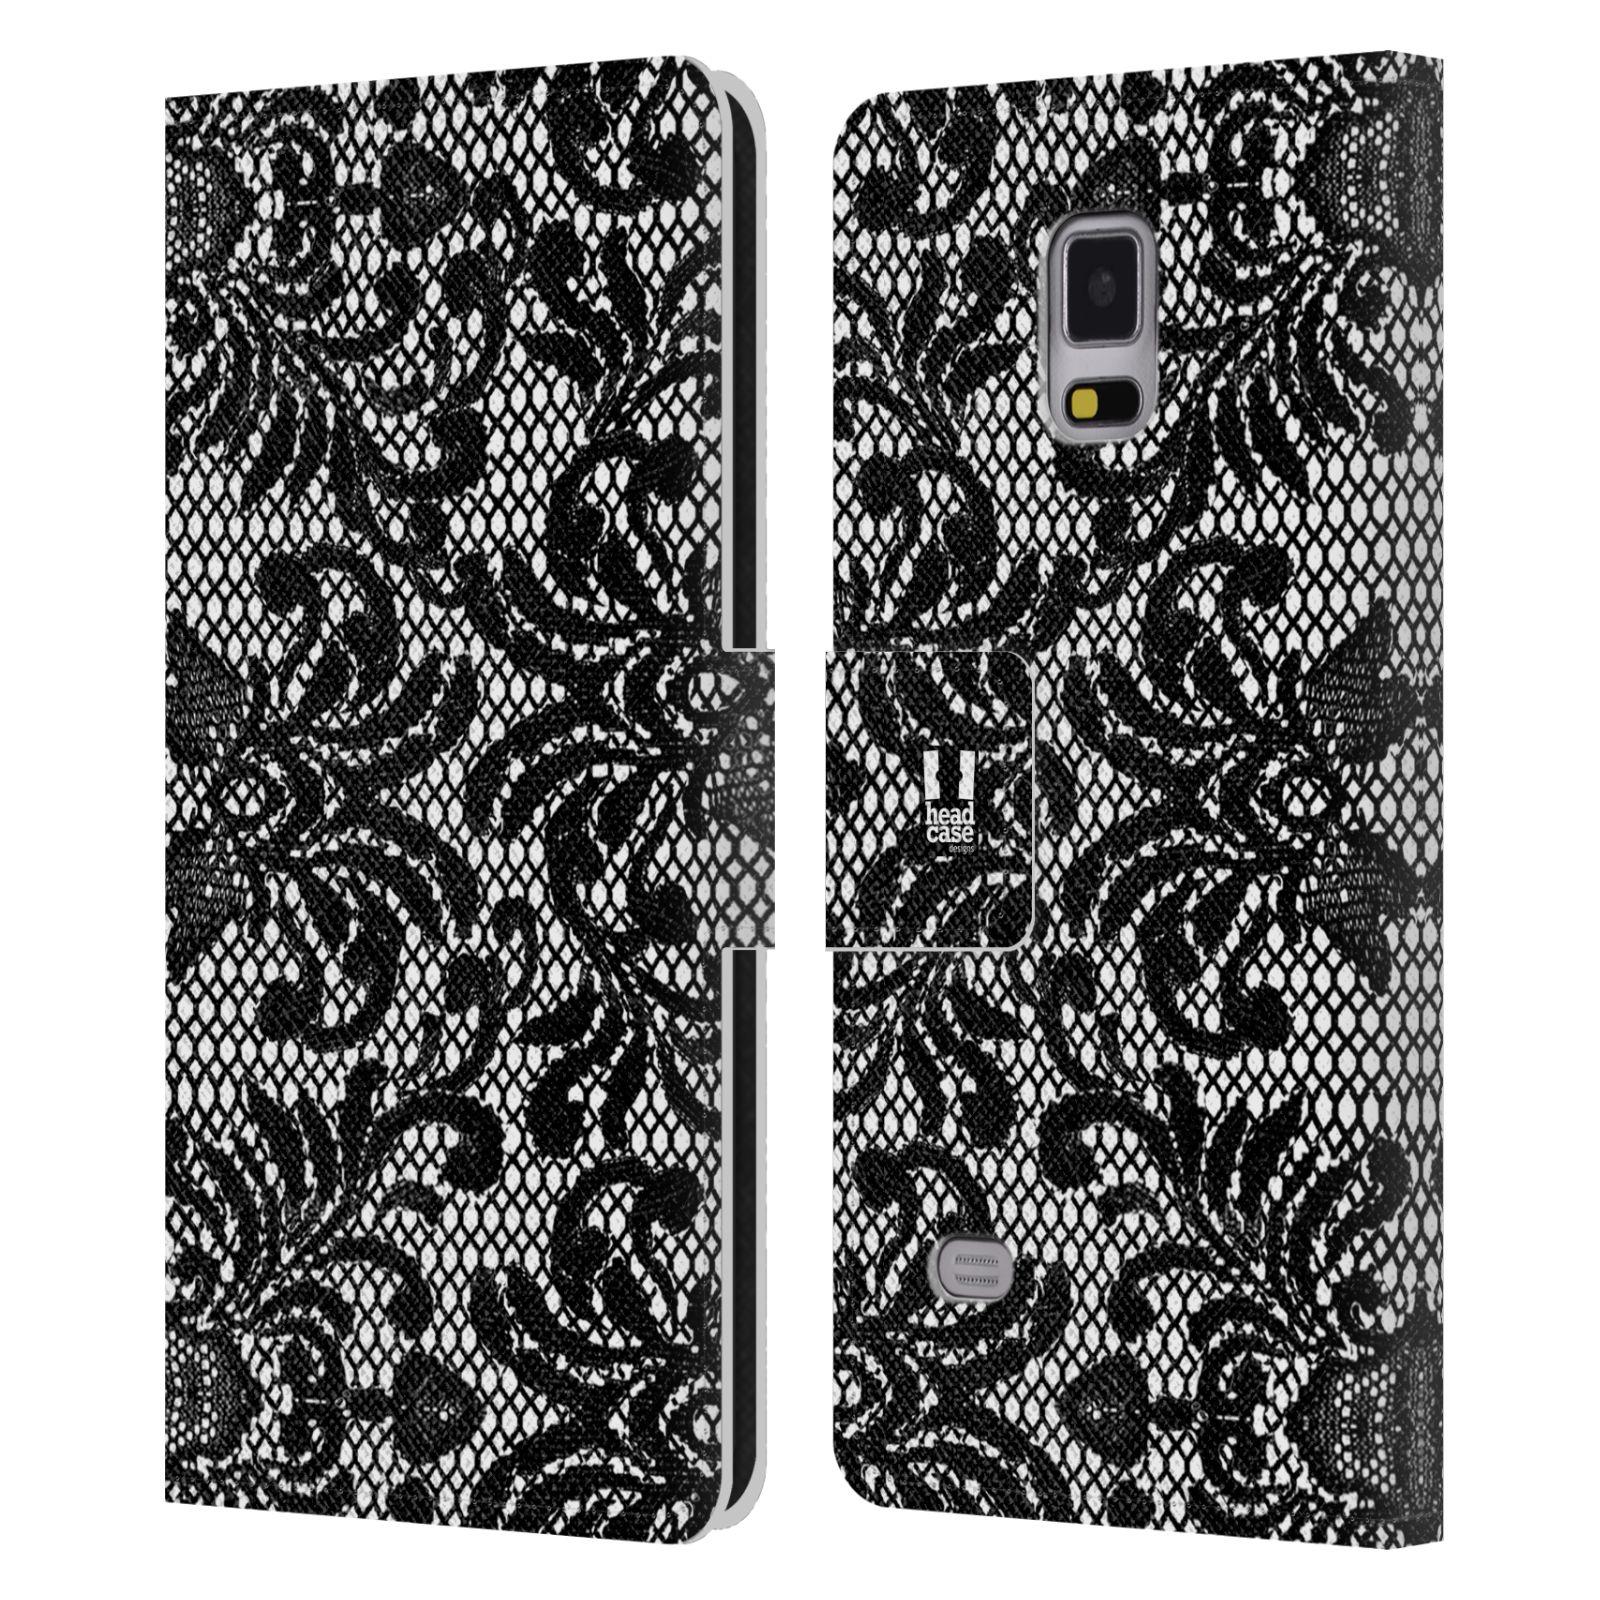 HEAD CASE Flipové pouzdro pro mobil Samsung Galaxy Note 4 ČERNOBÍLÁ KRAJKA fontána baroko